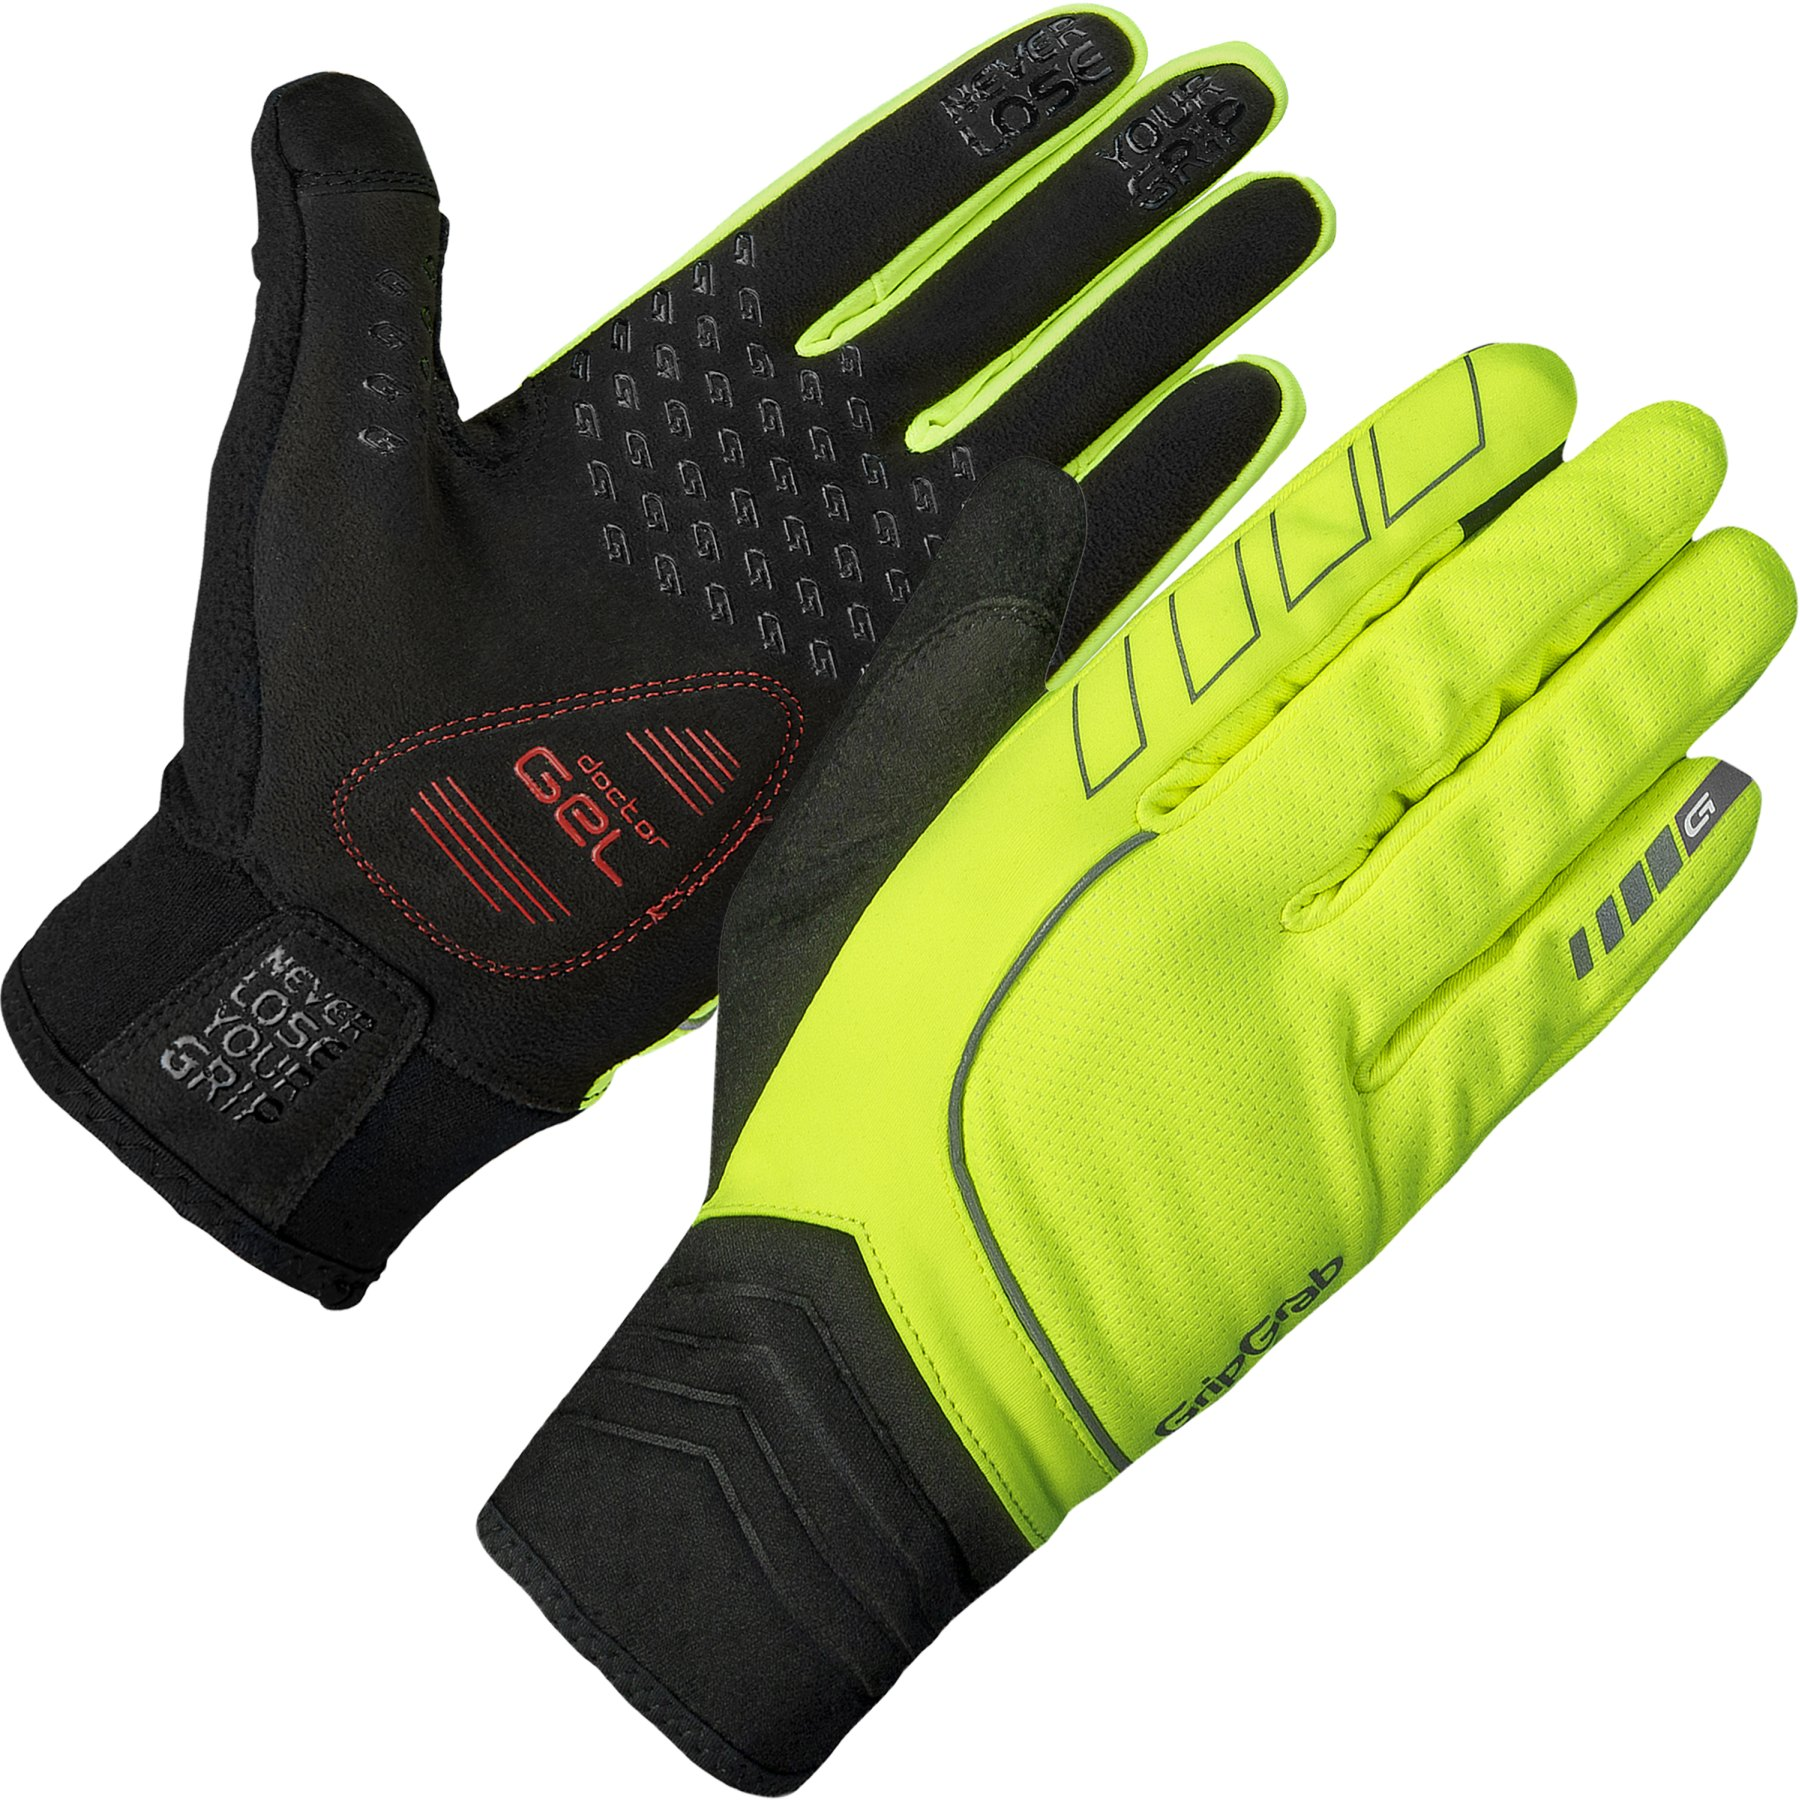 GripGrab Hurricane Hi-Vis Windproof Midseason Glove - Yellow Hi-Vis